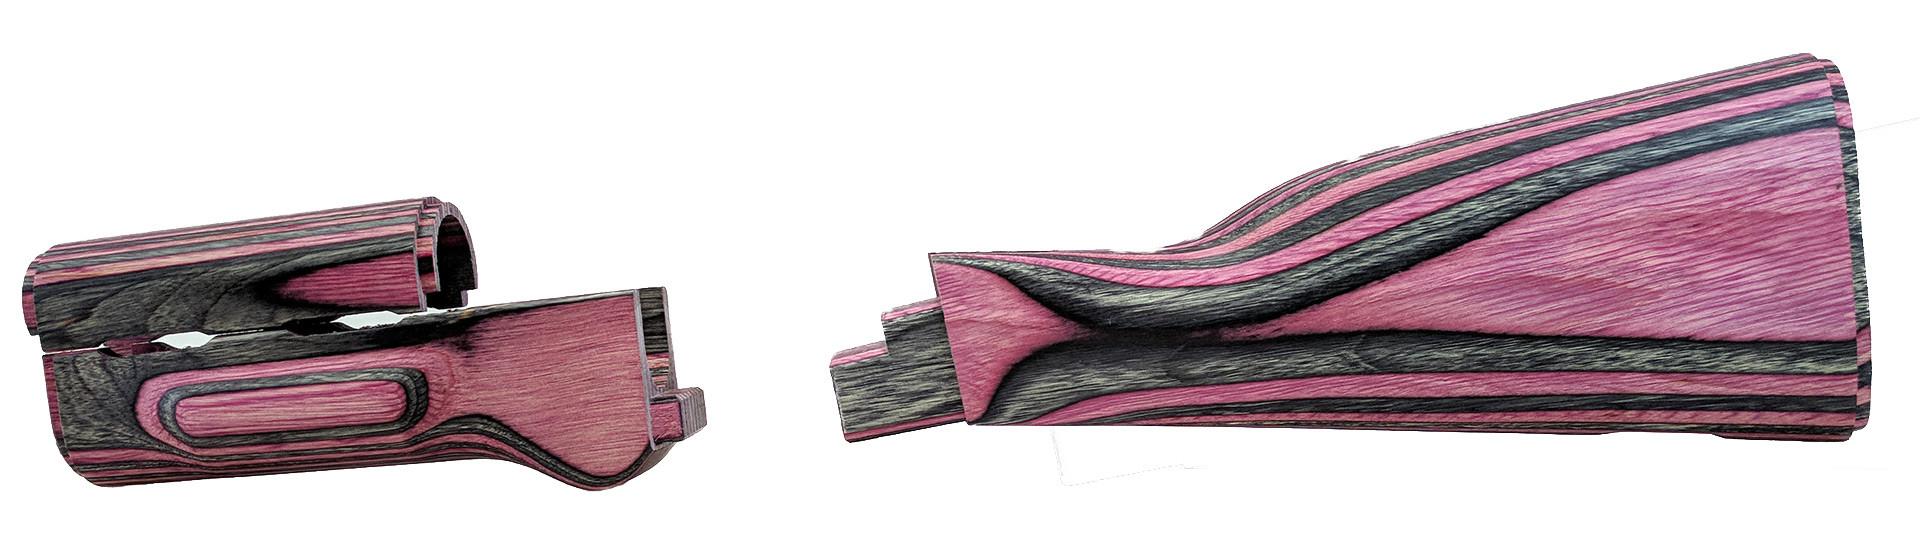 AK Laminated Furniture Set, Plum, w/o Grip, *NEW*